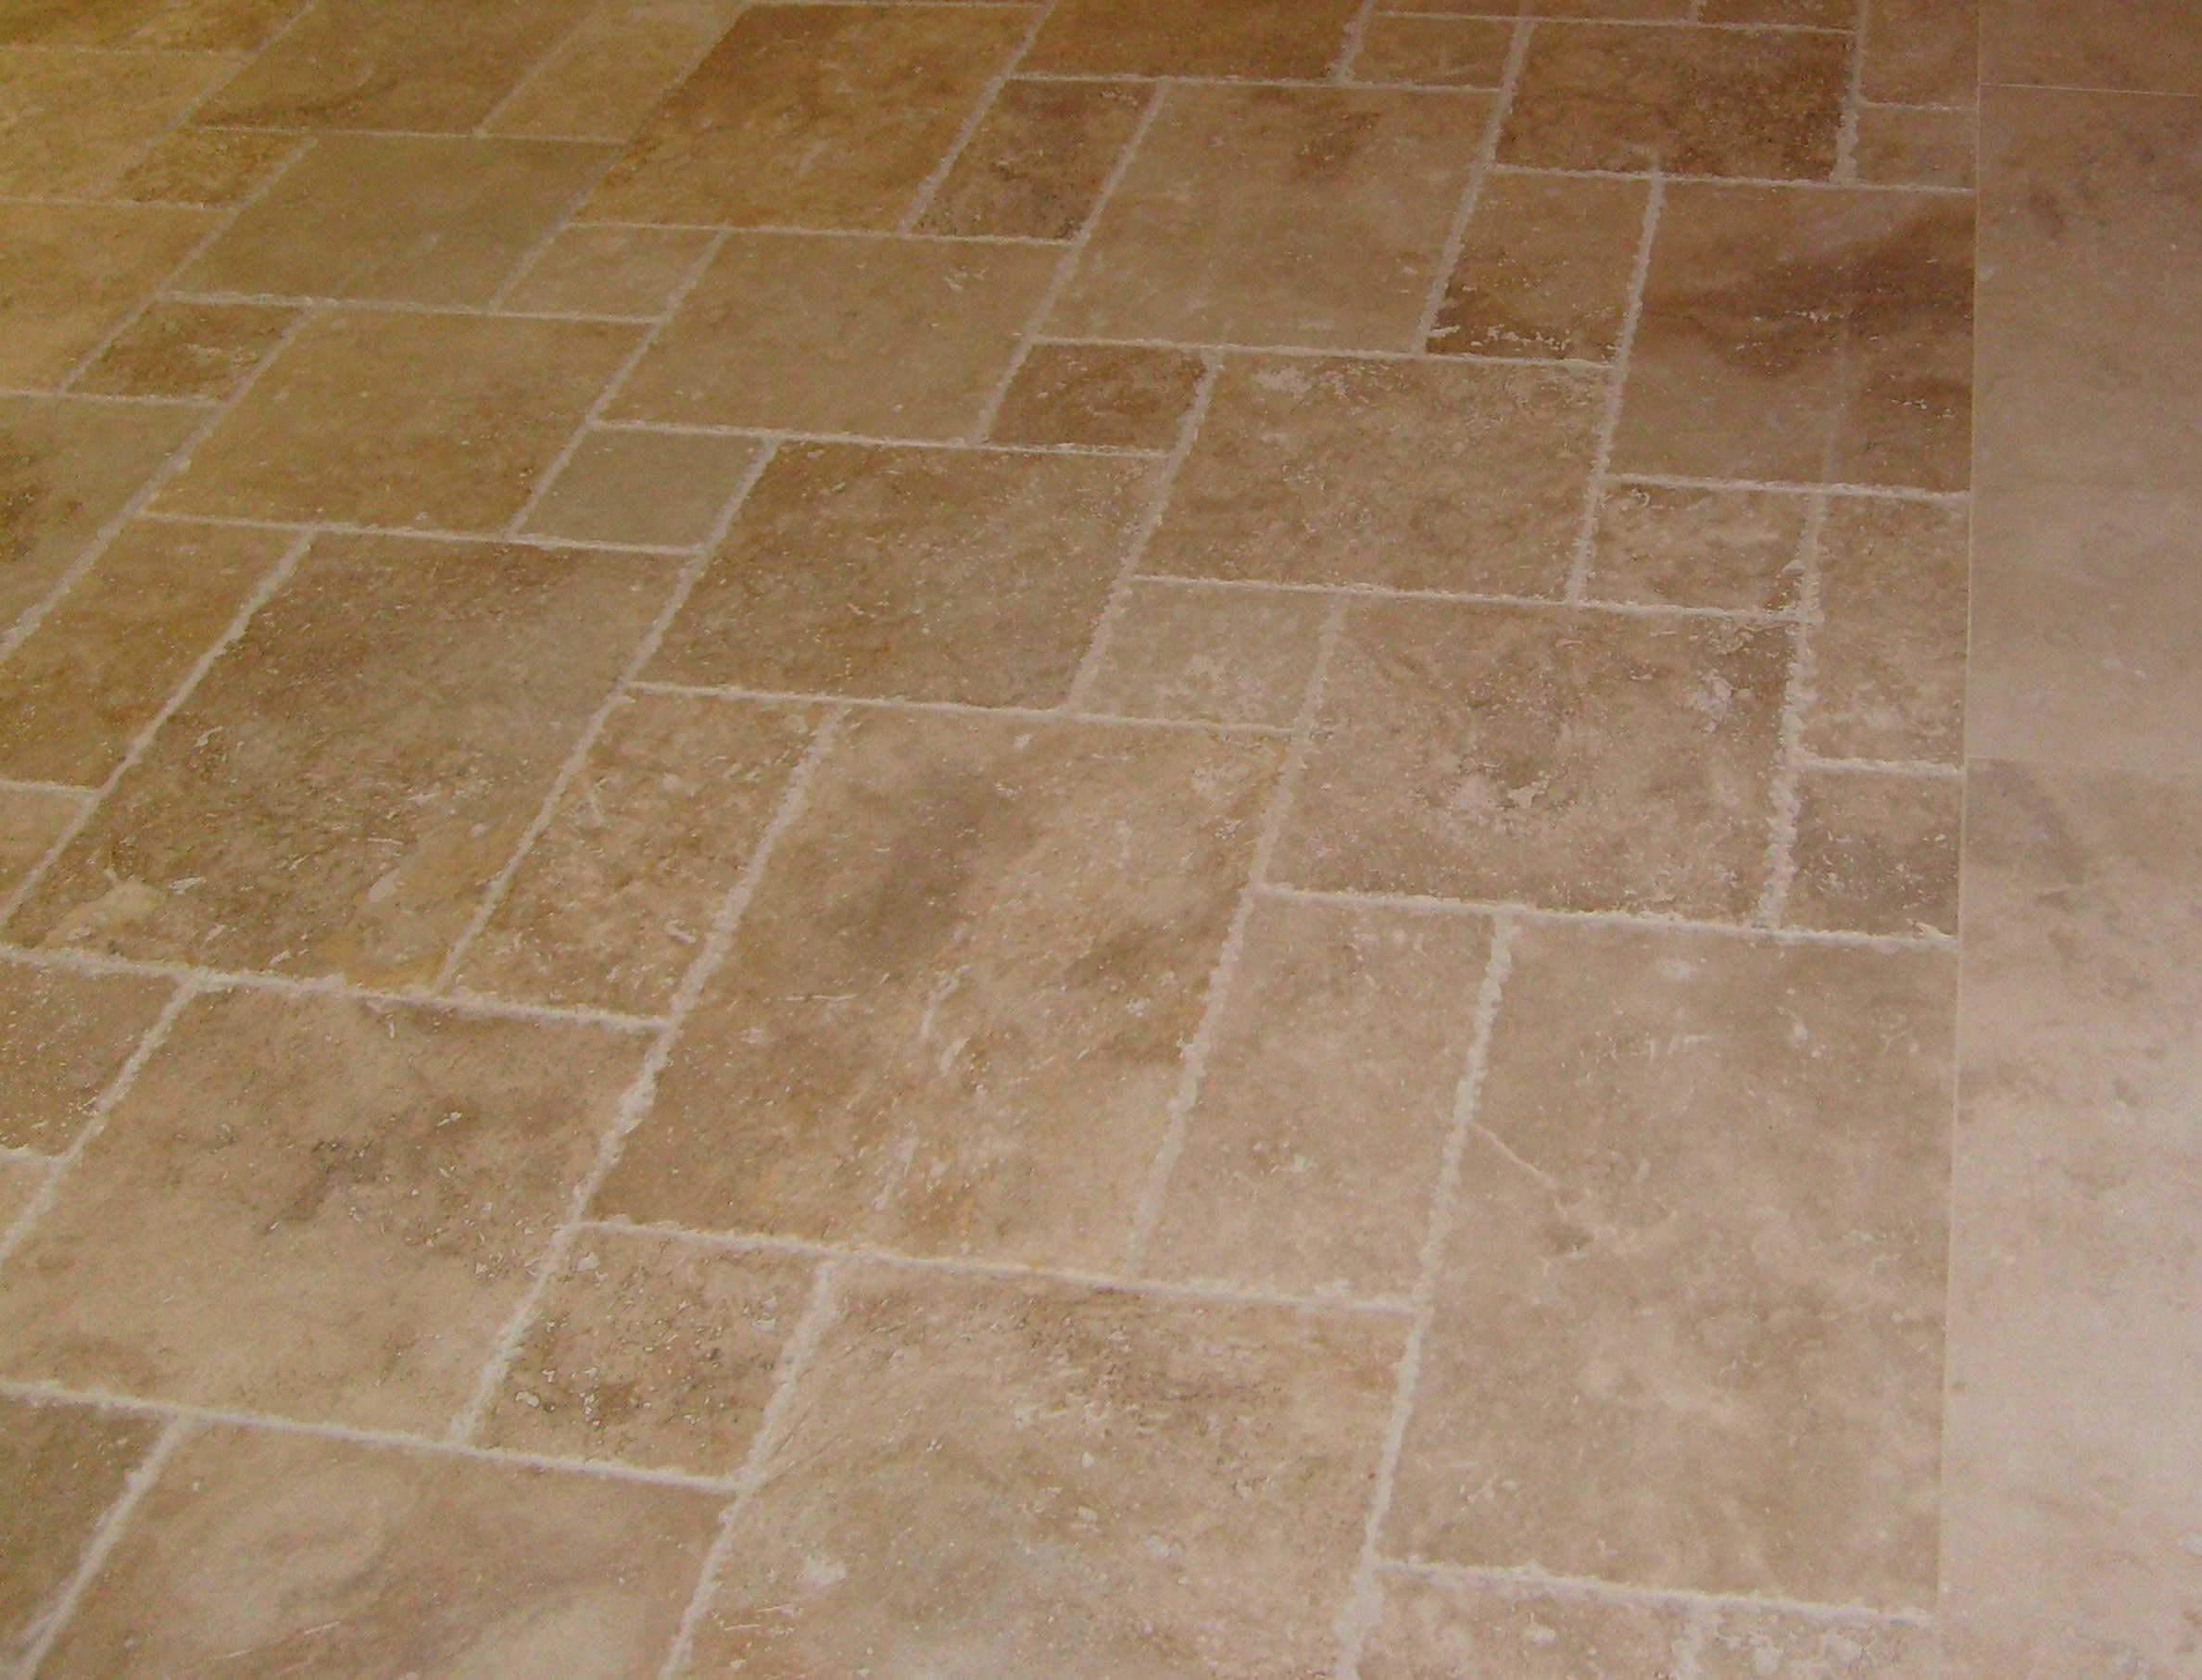 Floor Pattern In Tile